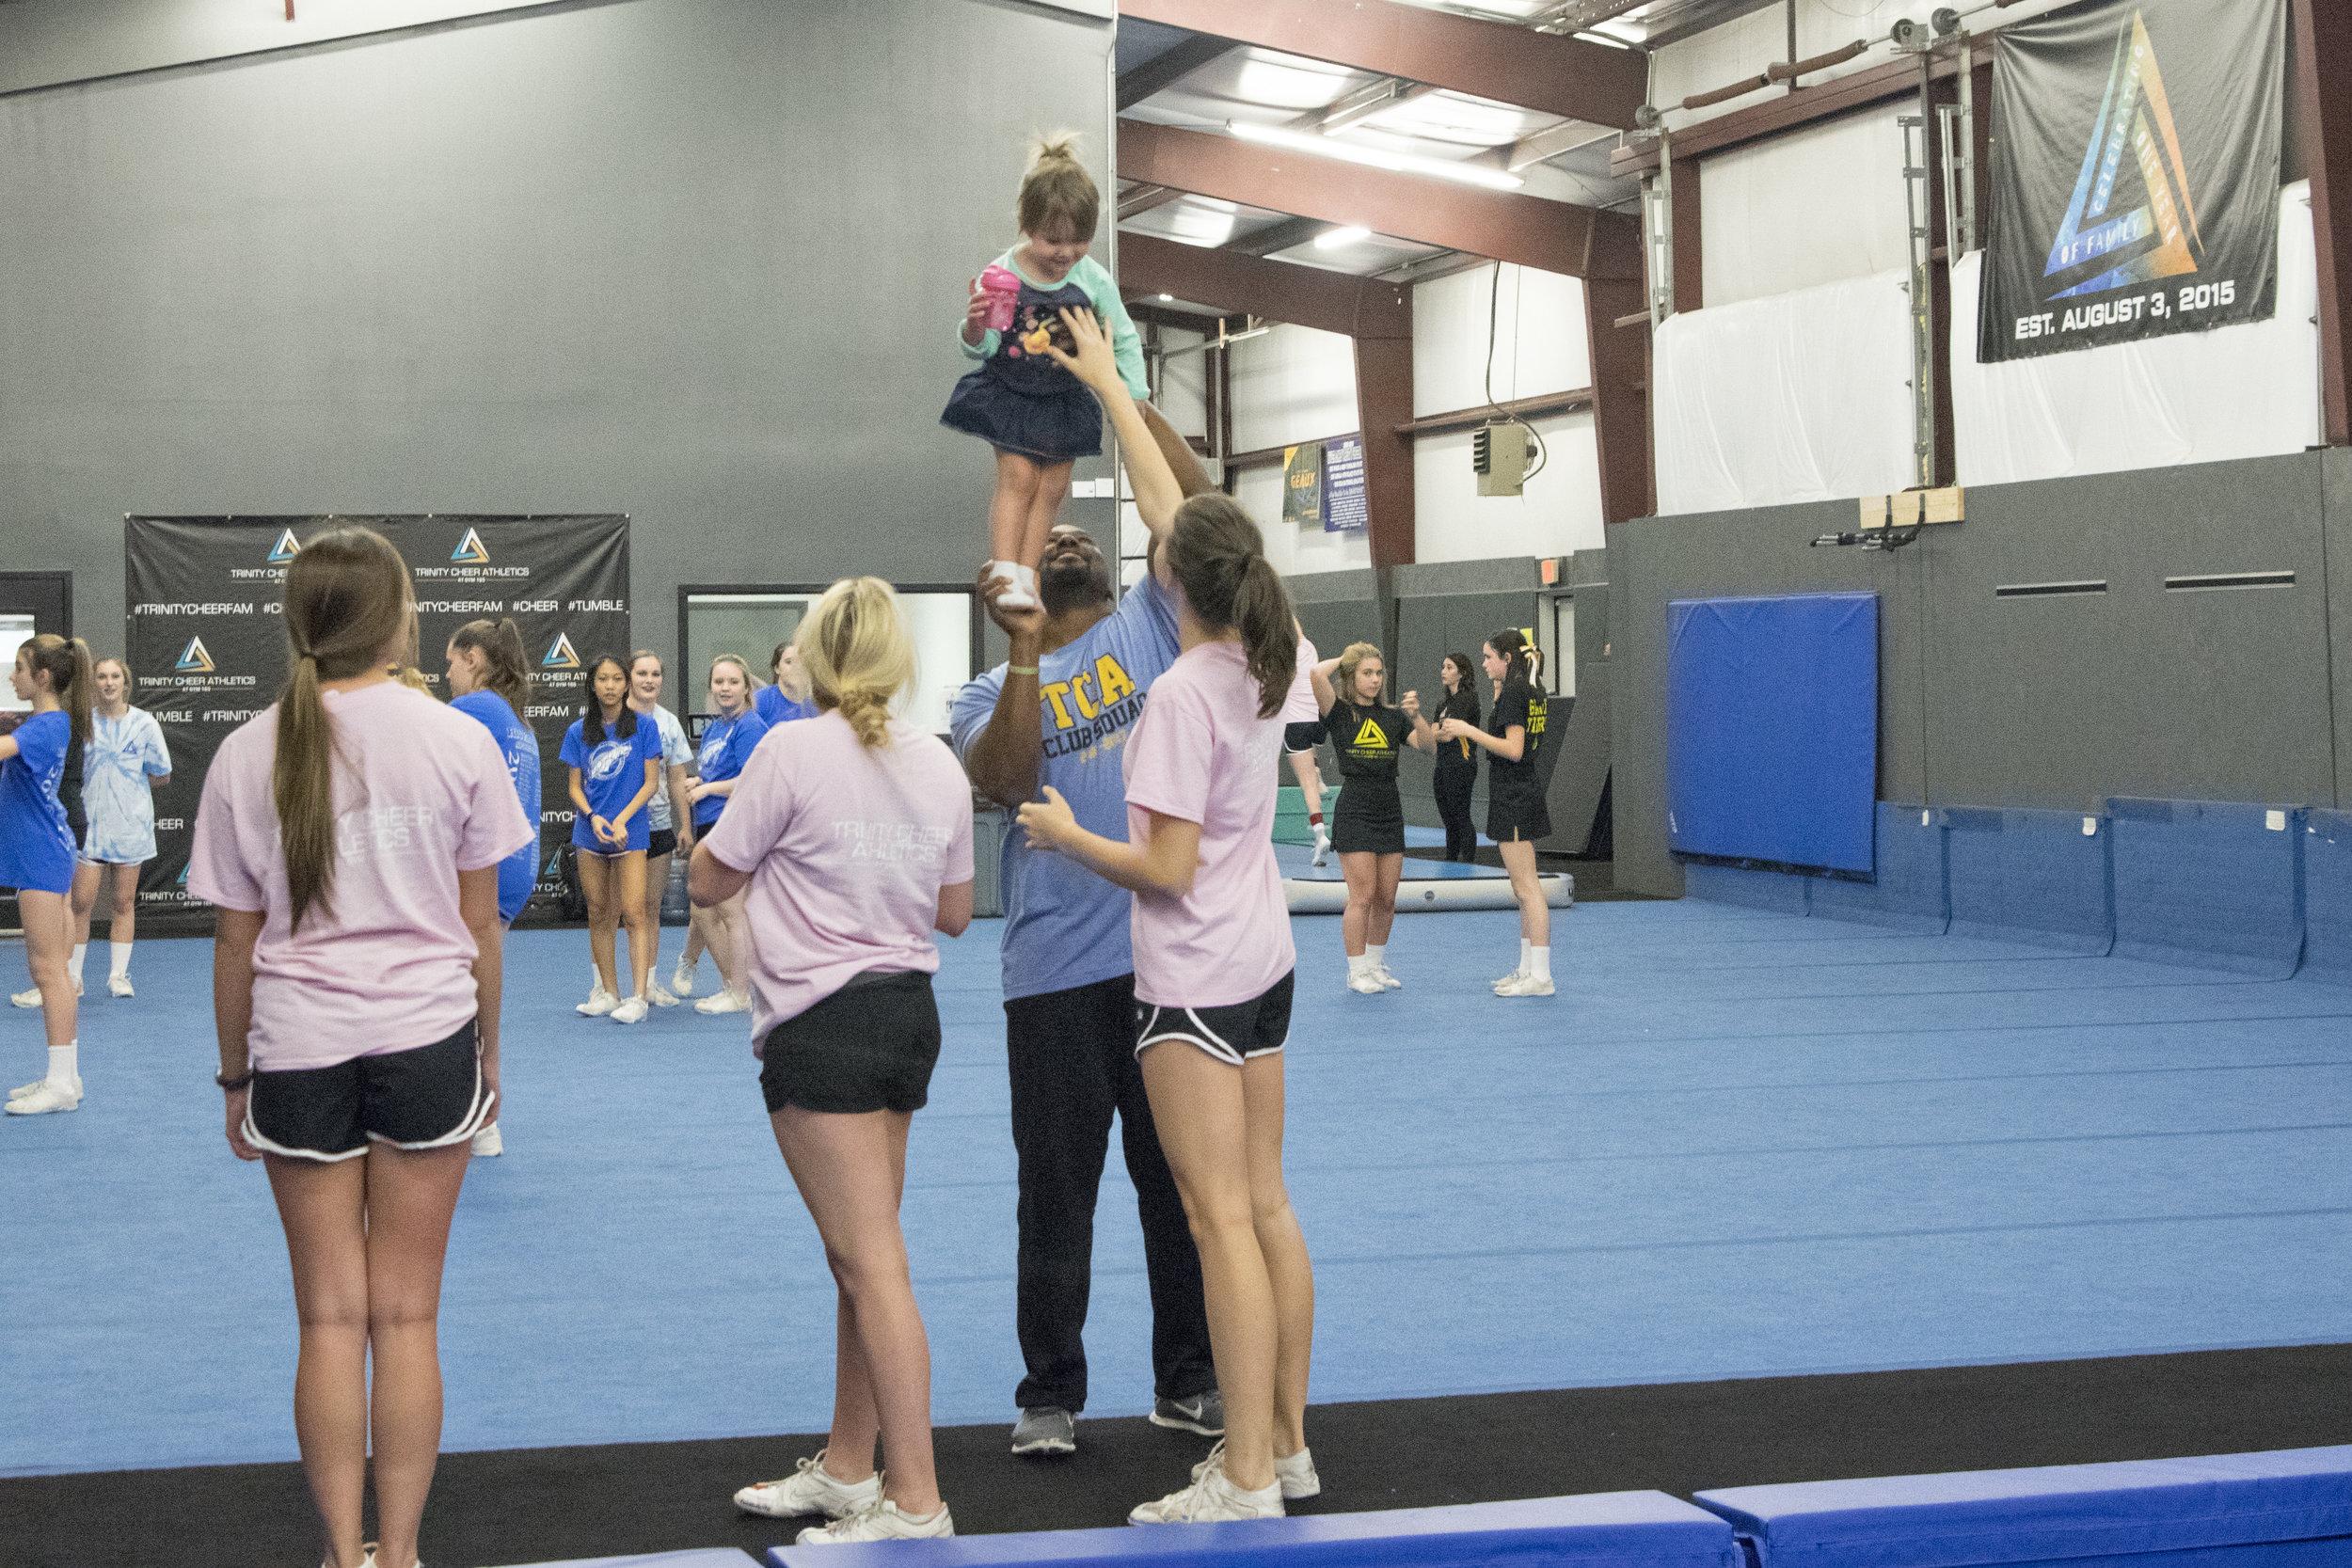 Baby Cheerleader